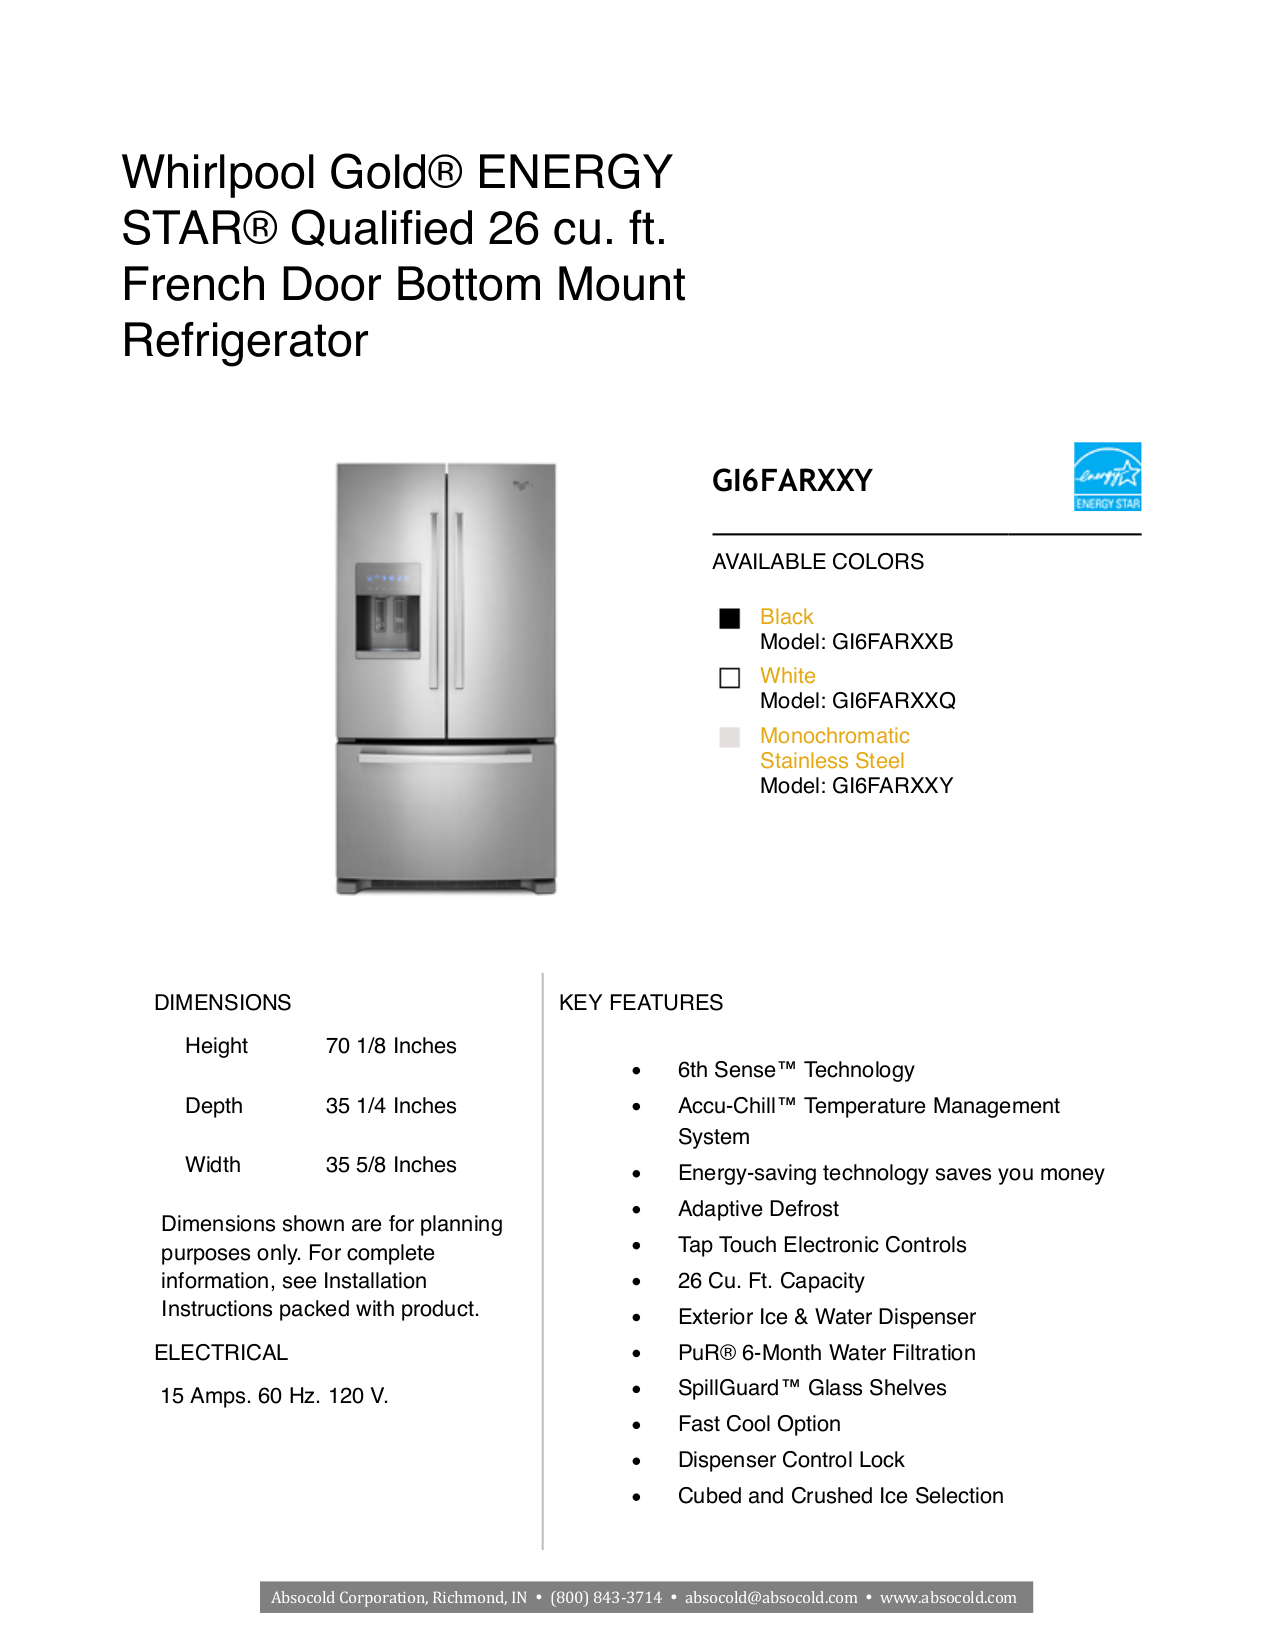 download free pdf for whirlpool gold gi6farxxy refrigerator manual rh umlib com whirlpool fridge manual for model wrx988sibm whirlpool fridge manual for model wrs571c1dw